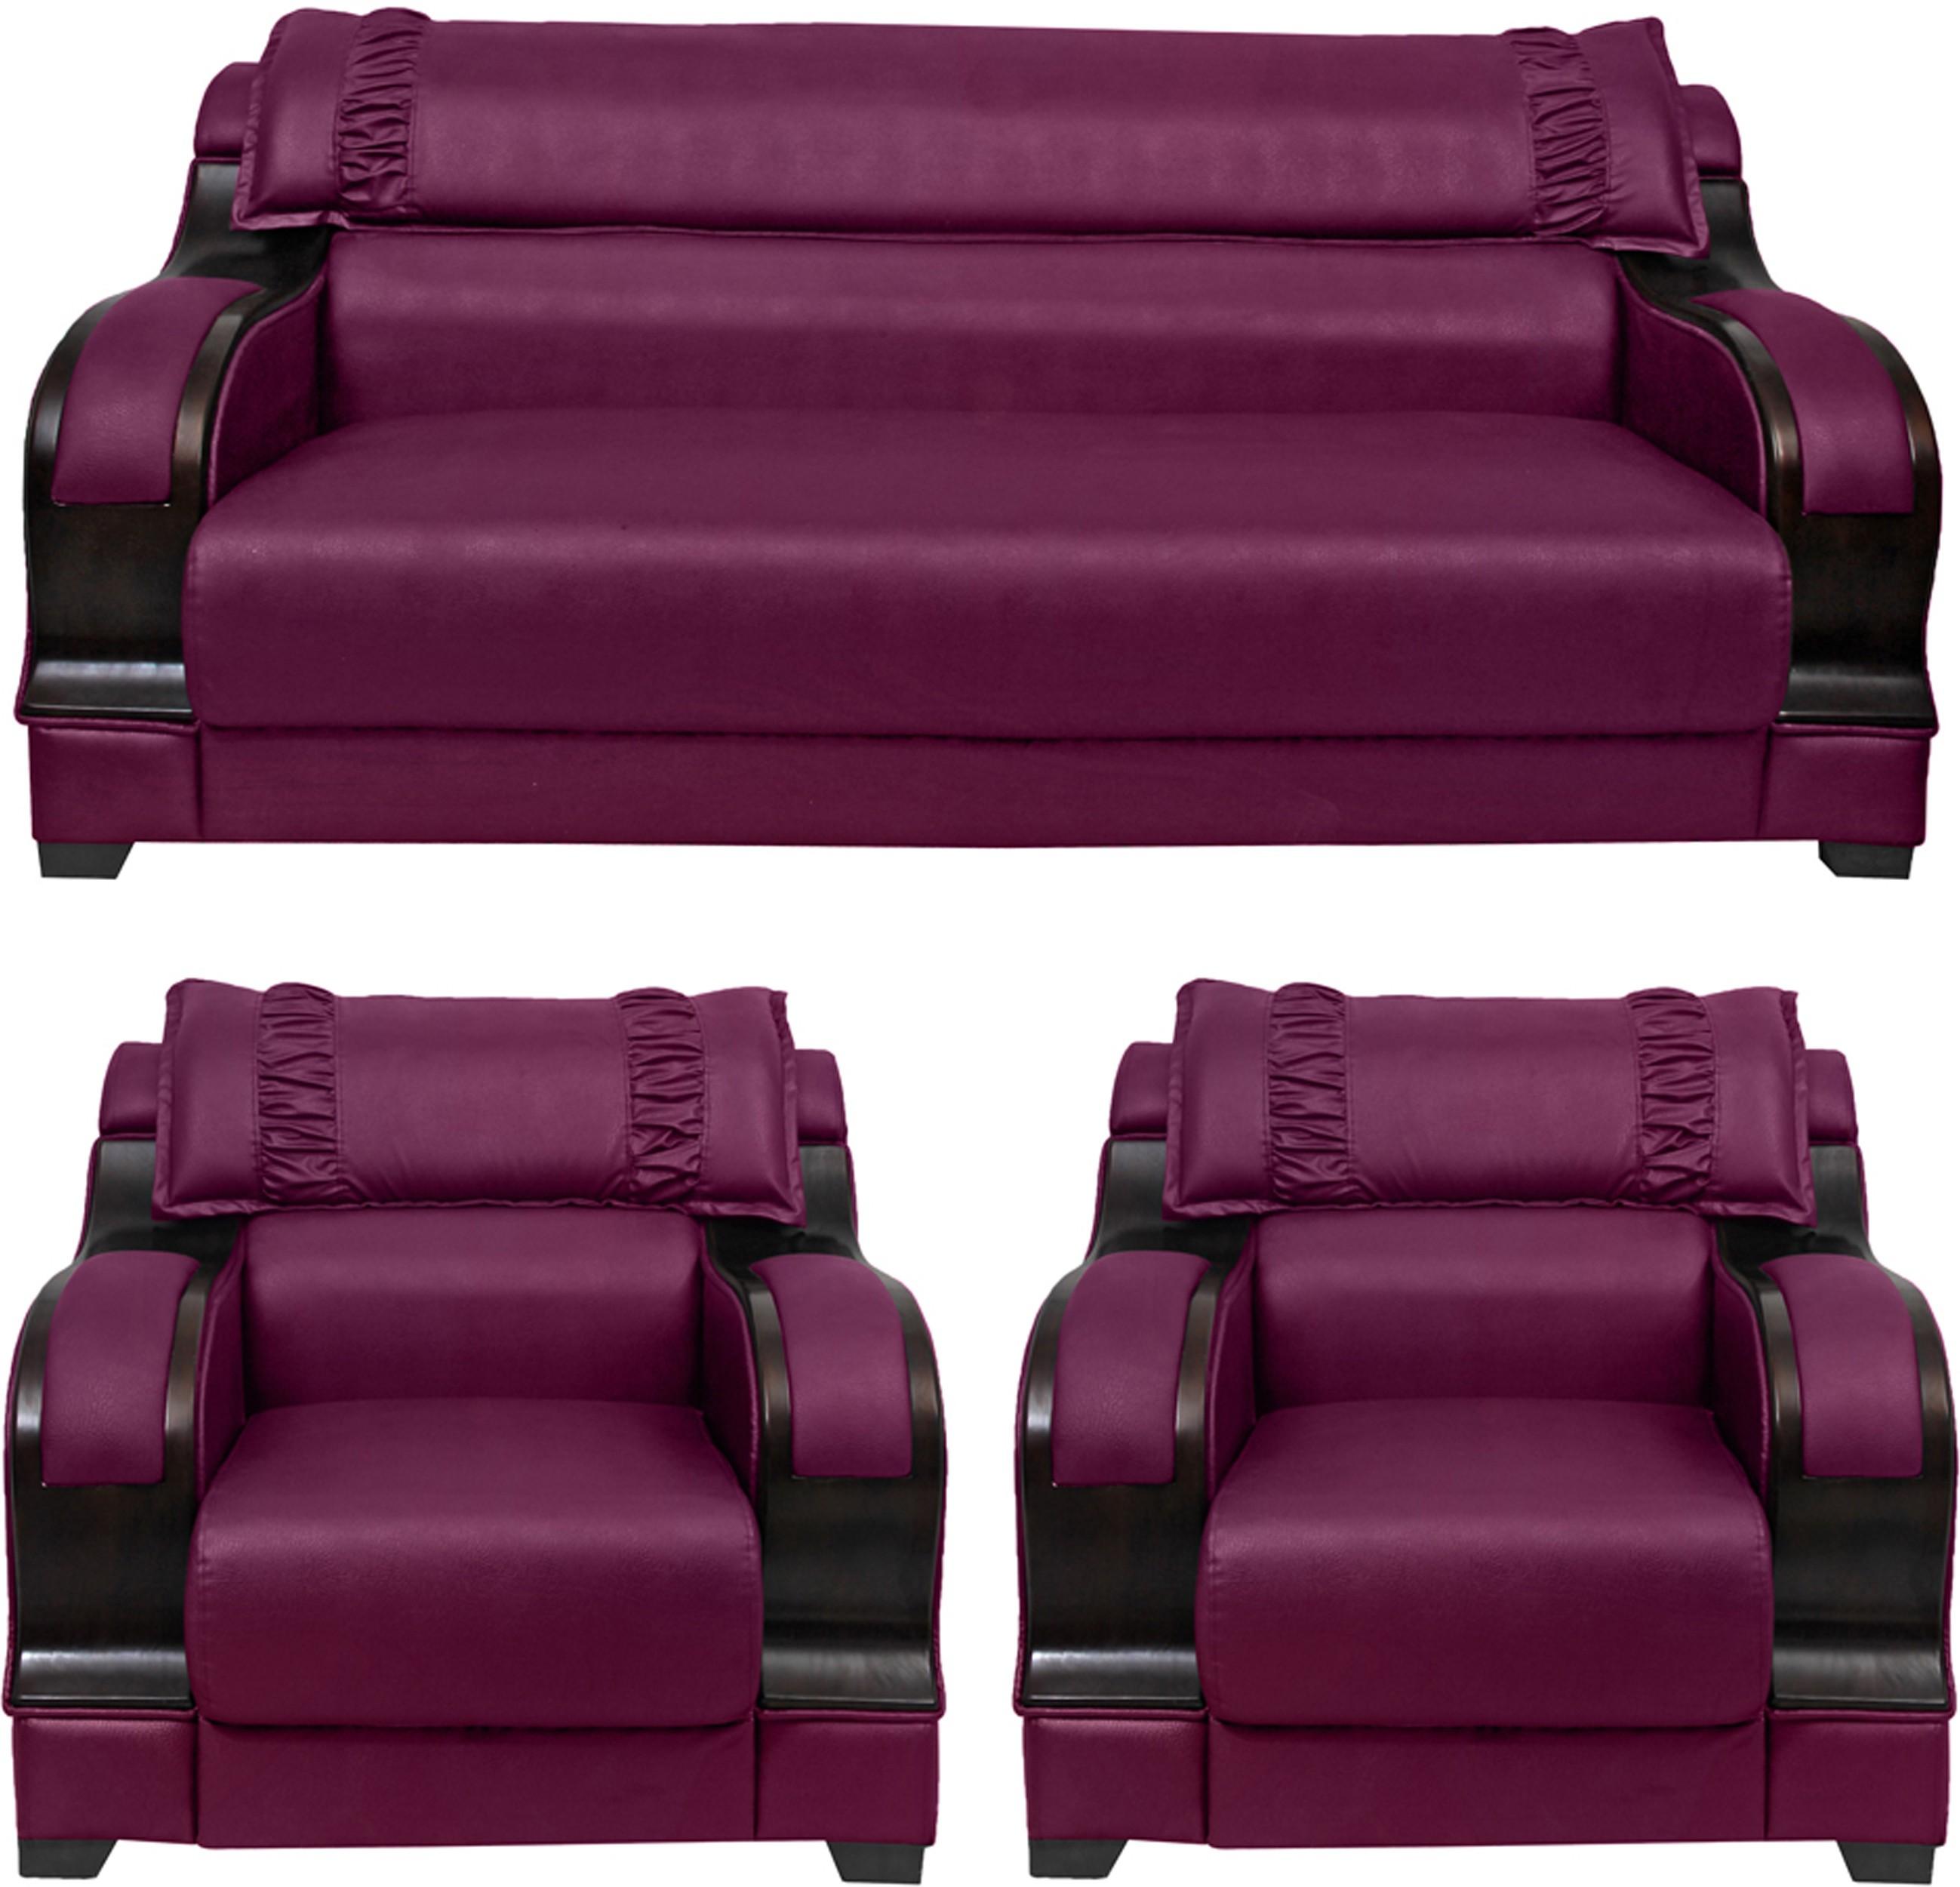 HOMESTOCK Solid Wood 3 + 1 + 1 Purple Sofa Set(Configuration - Straight)